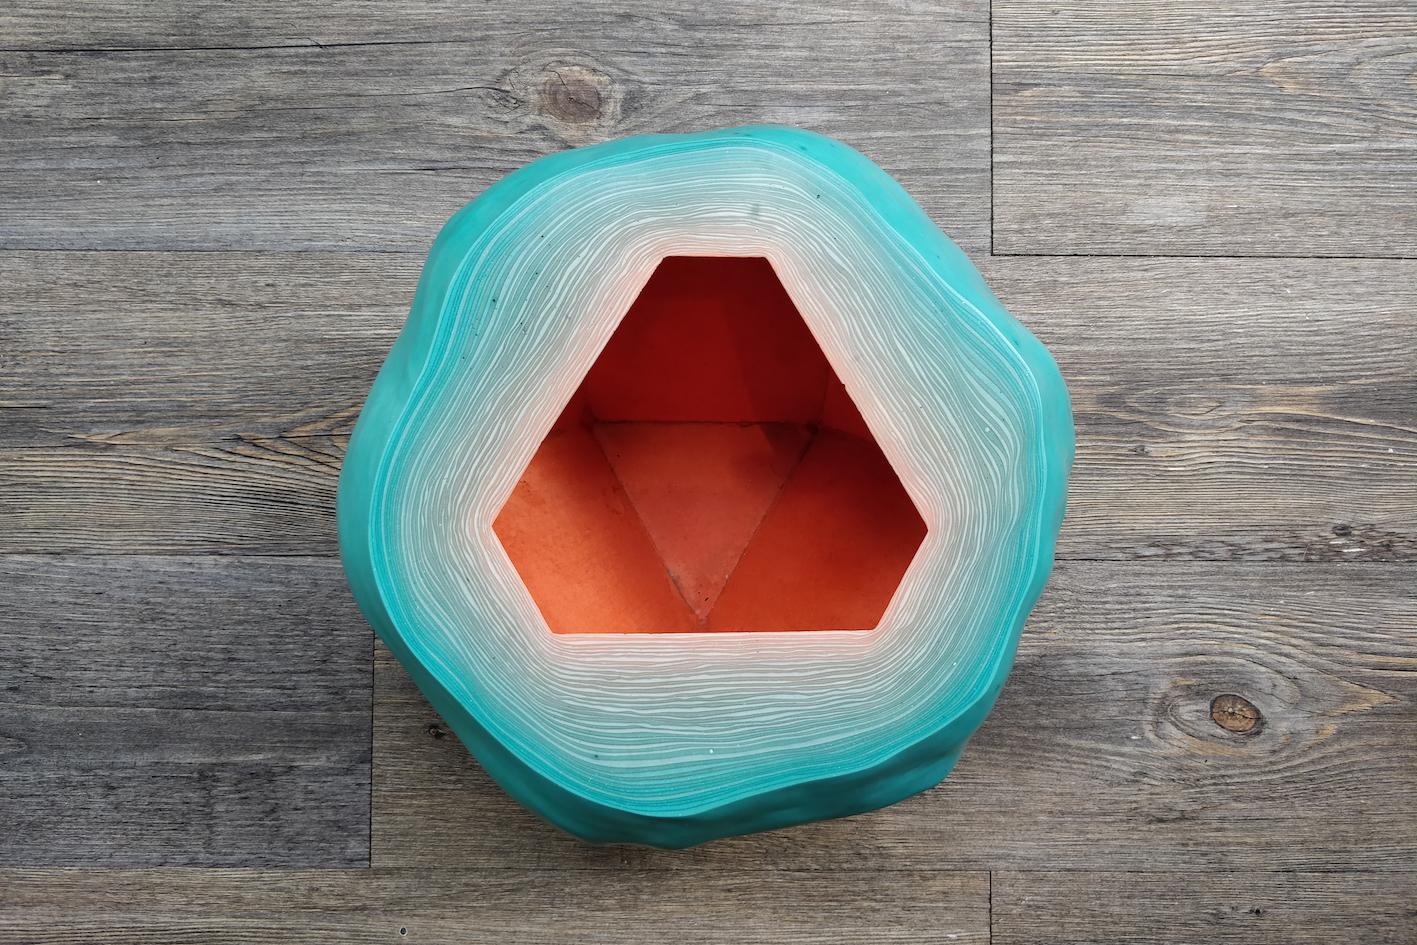 Fuzz Bowl Geometric / Turquoise Red